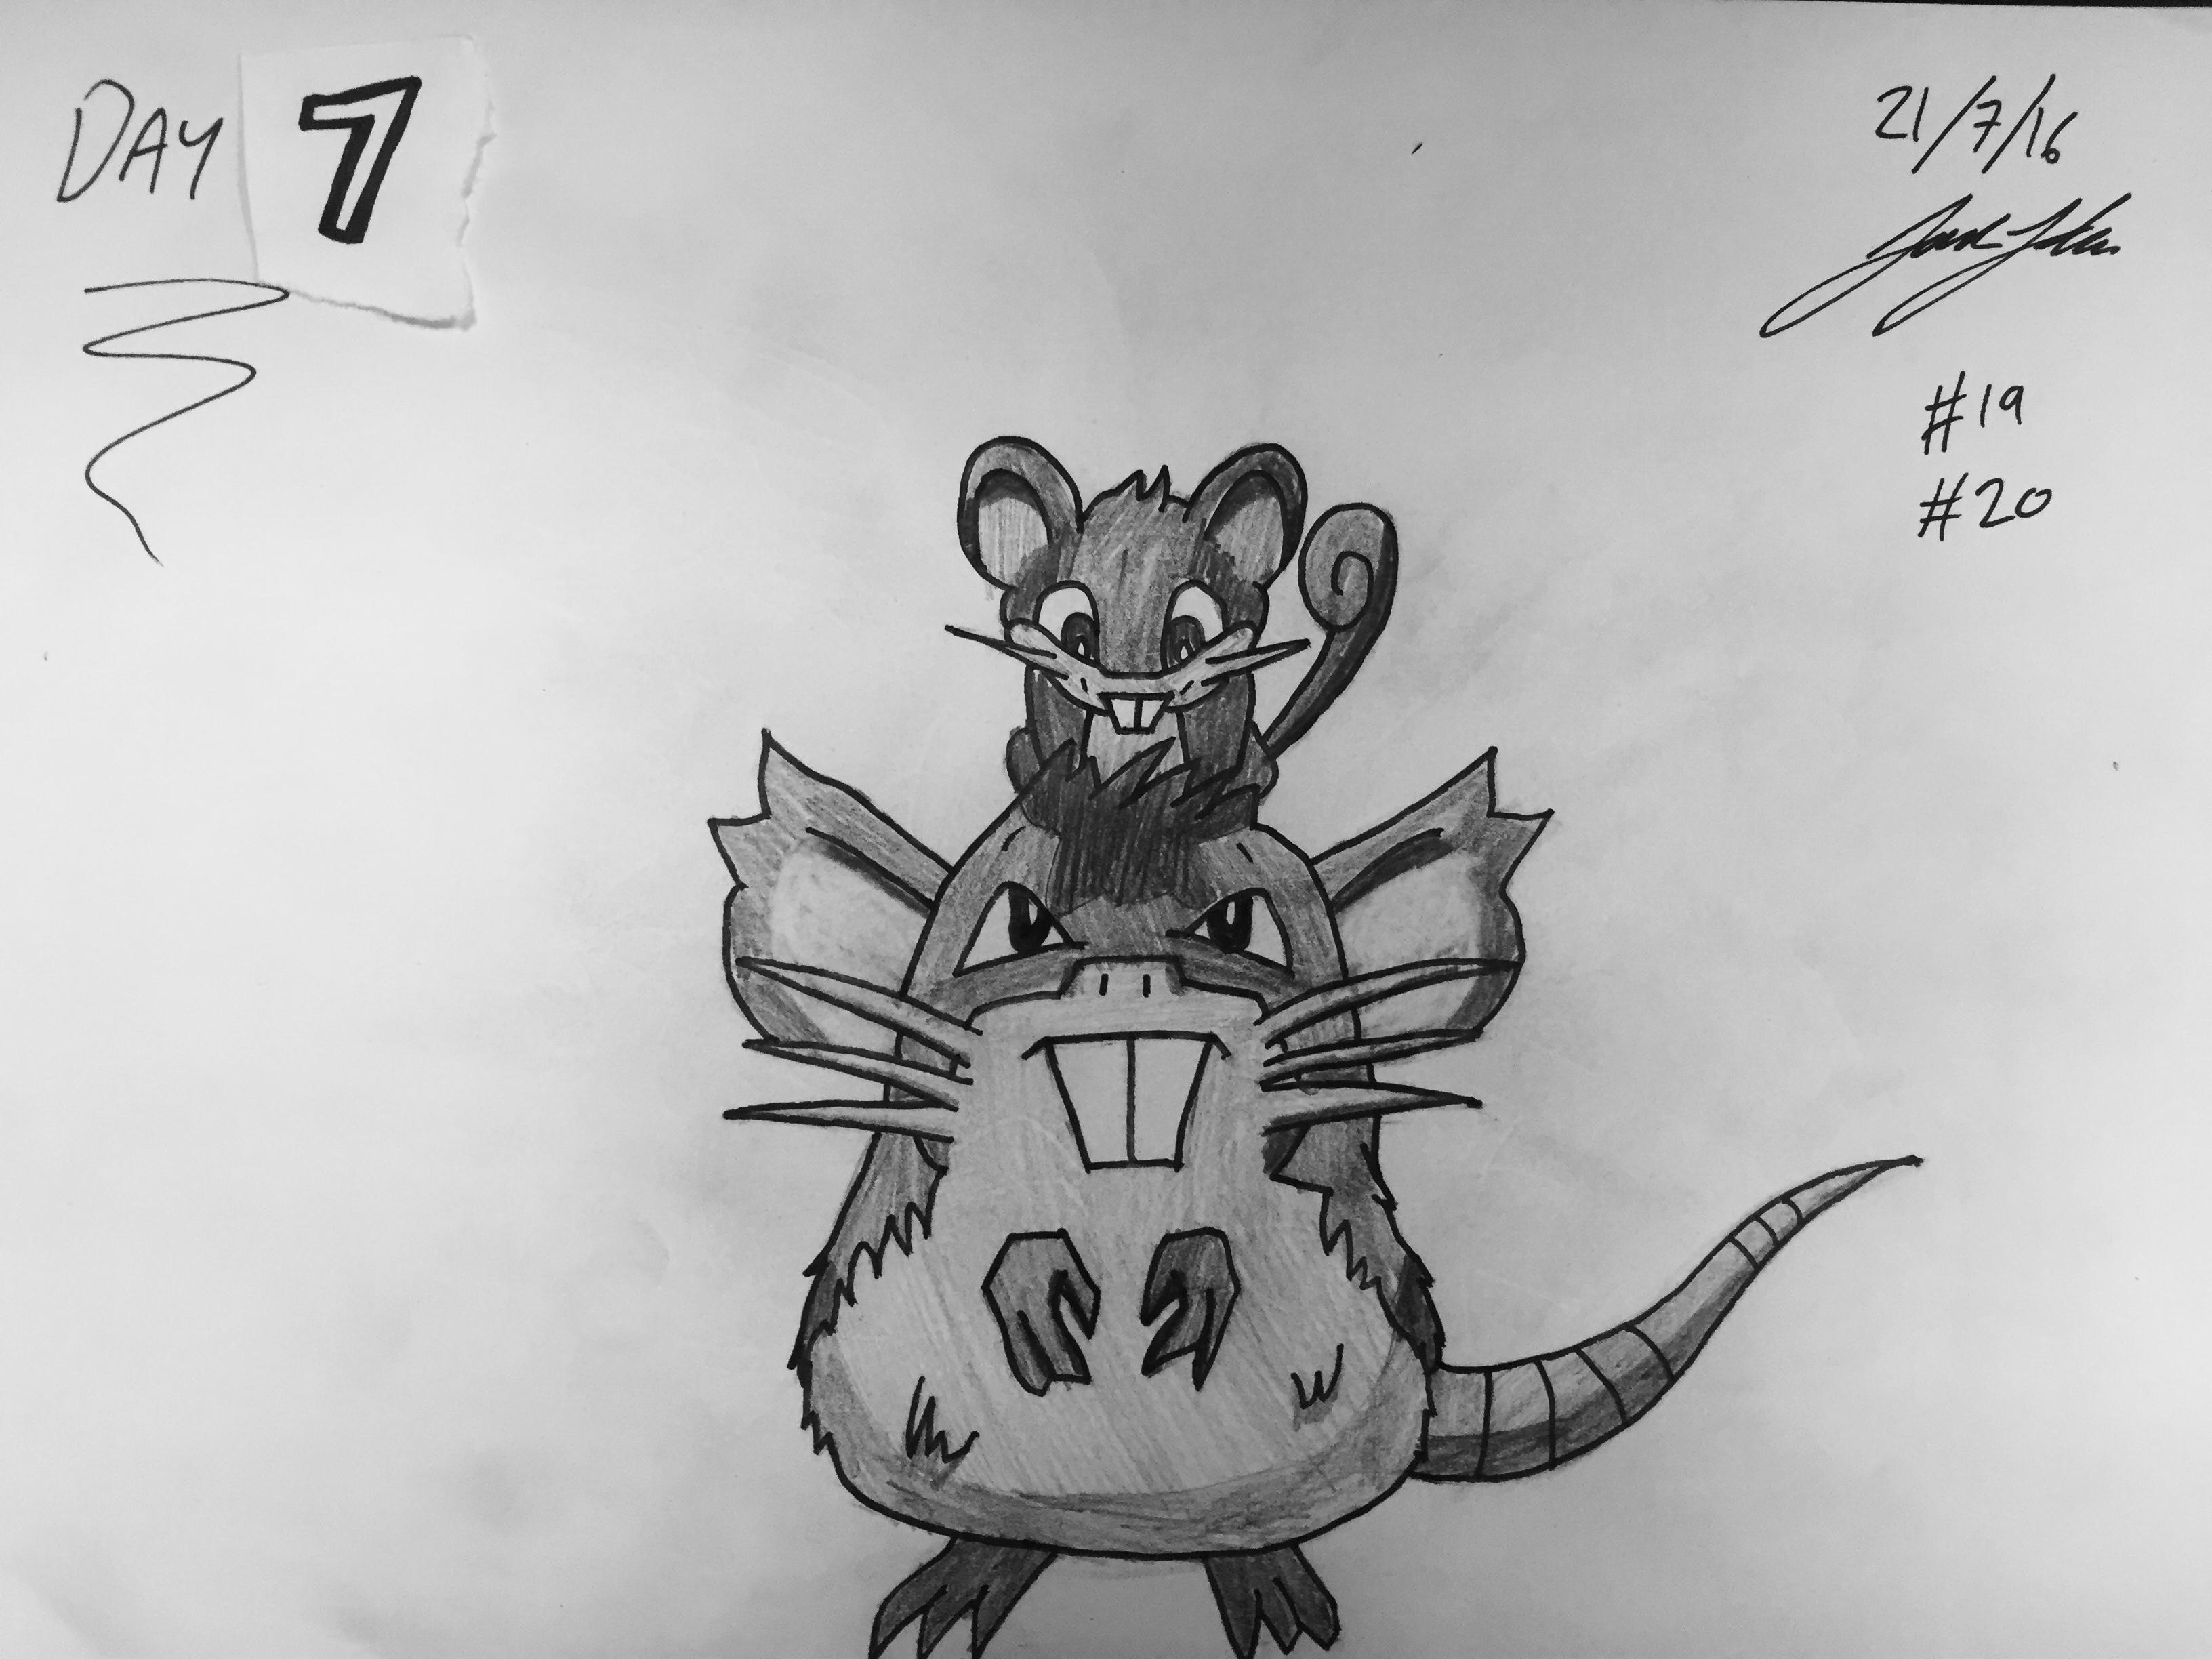 #19 Rattata #20 Raticate